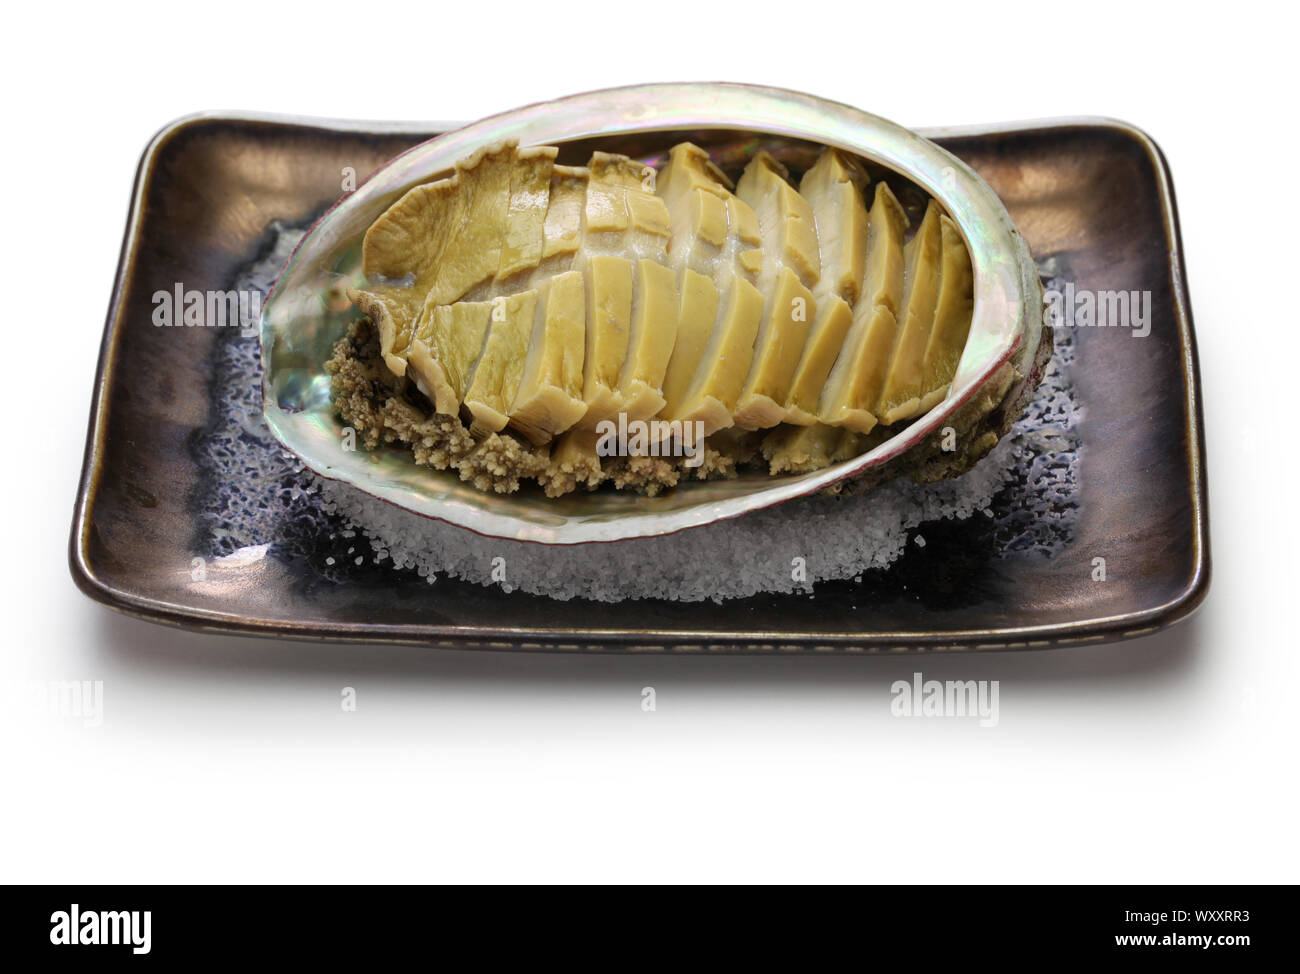 steamed abalone with sake, awabi no sakamushi, japanese cuisine Stock Photo